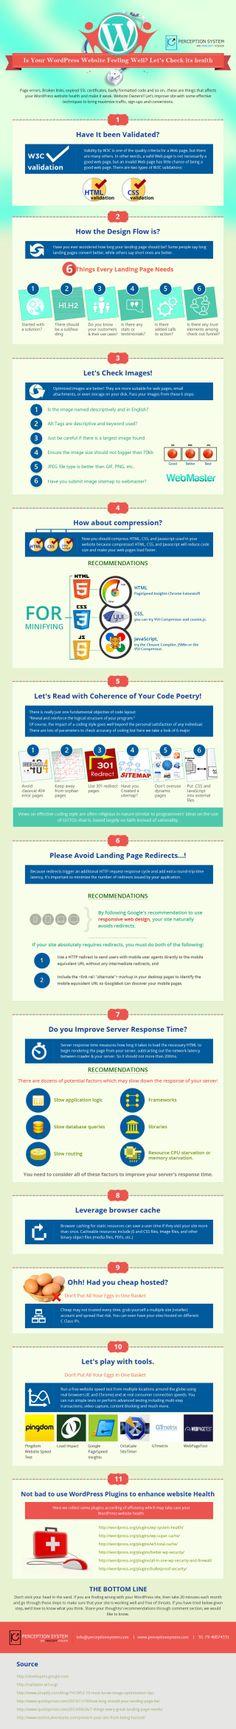 Is your WordPress feeling well #infografia #infographic #socialmedia